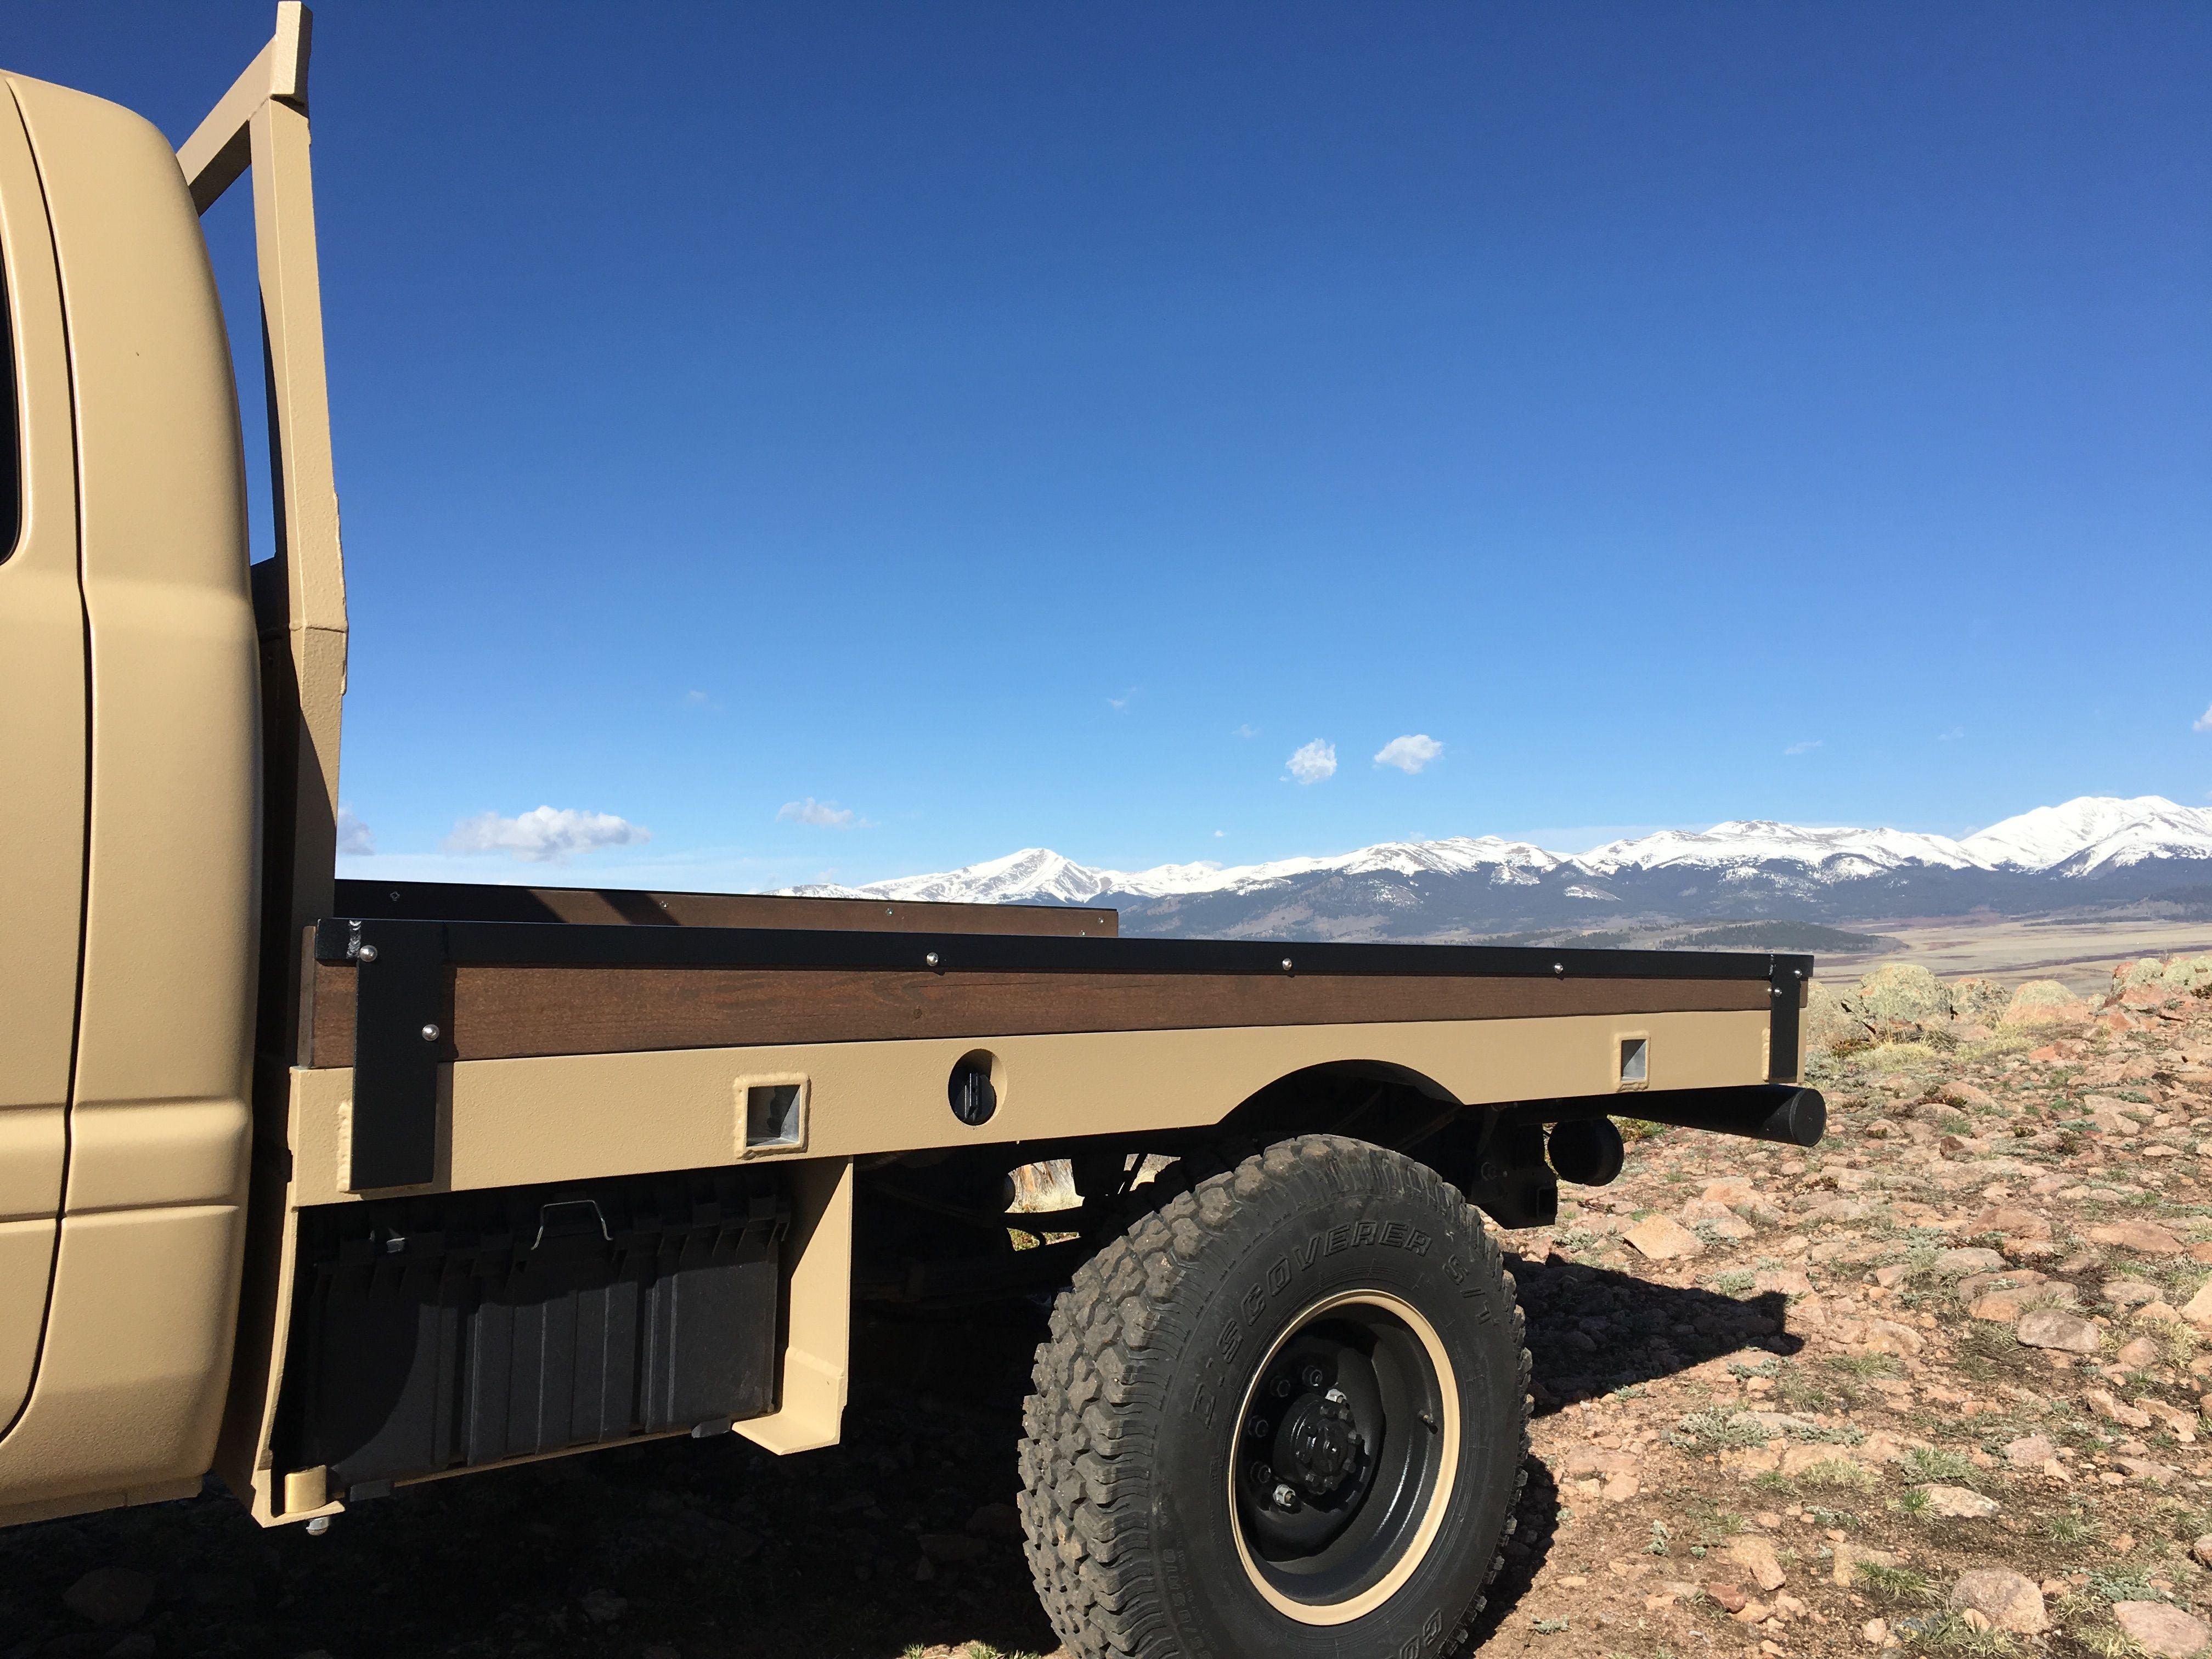 2nd Gen Dodge Custom Aluminum Flatbed With Side Boxes And Upol Raptor Paint Custom Truck Beds Built Truck Monster Trucks